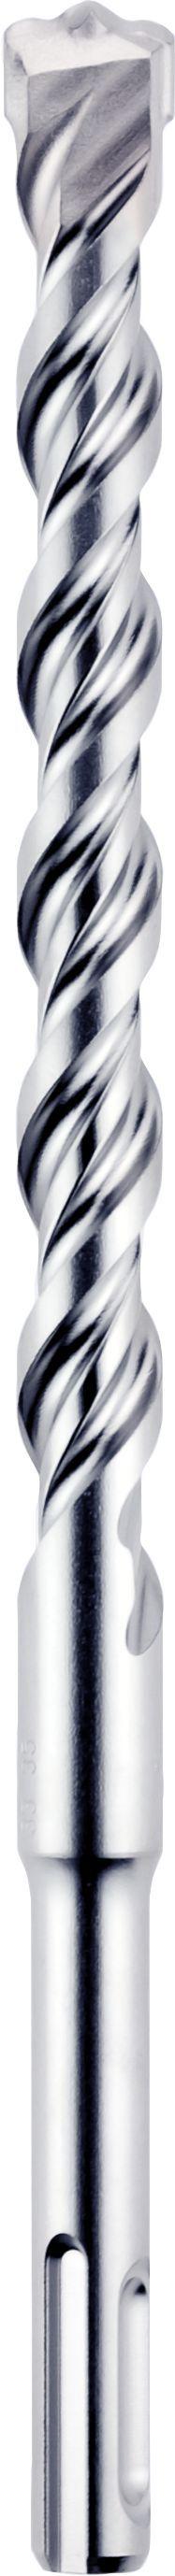 Slika BORER Rocket 3 SDS-plus 8x210 mm